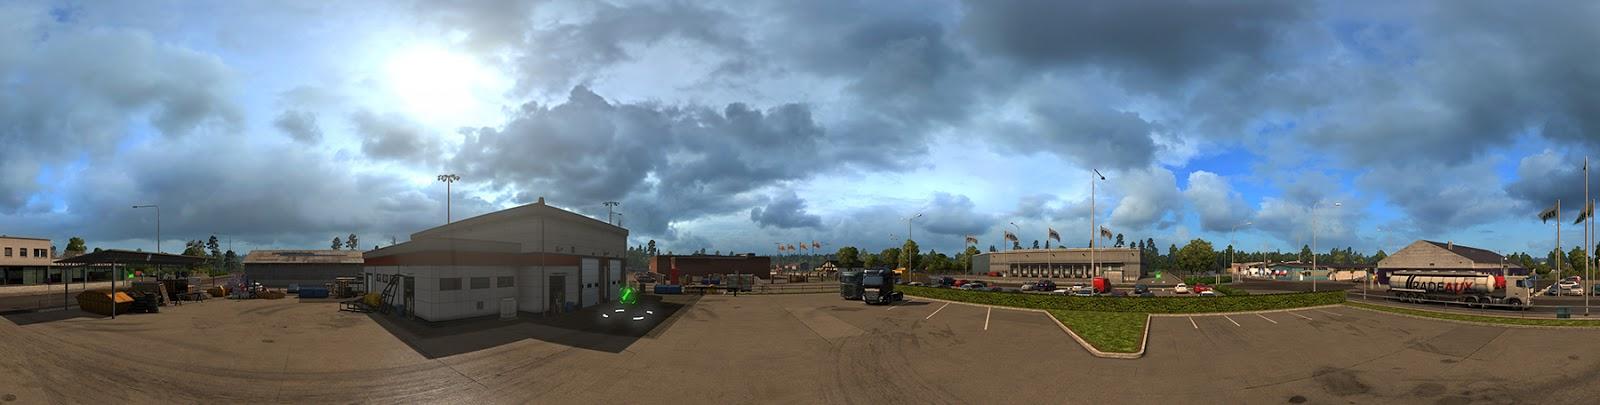 ets2_scandinavia_dlc_new_weather_009